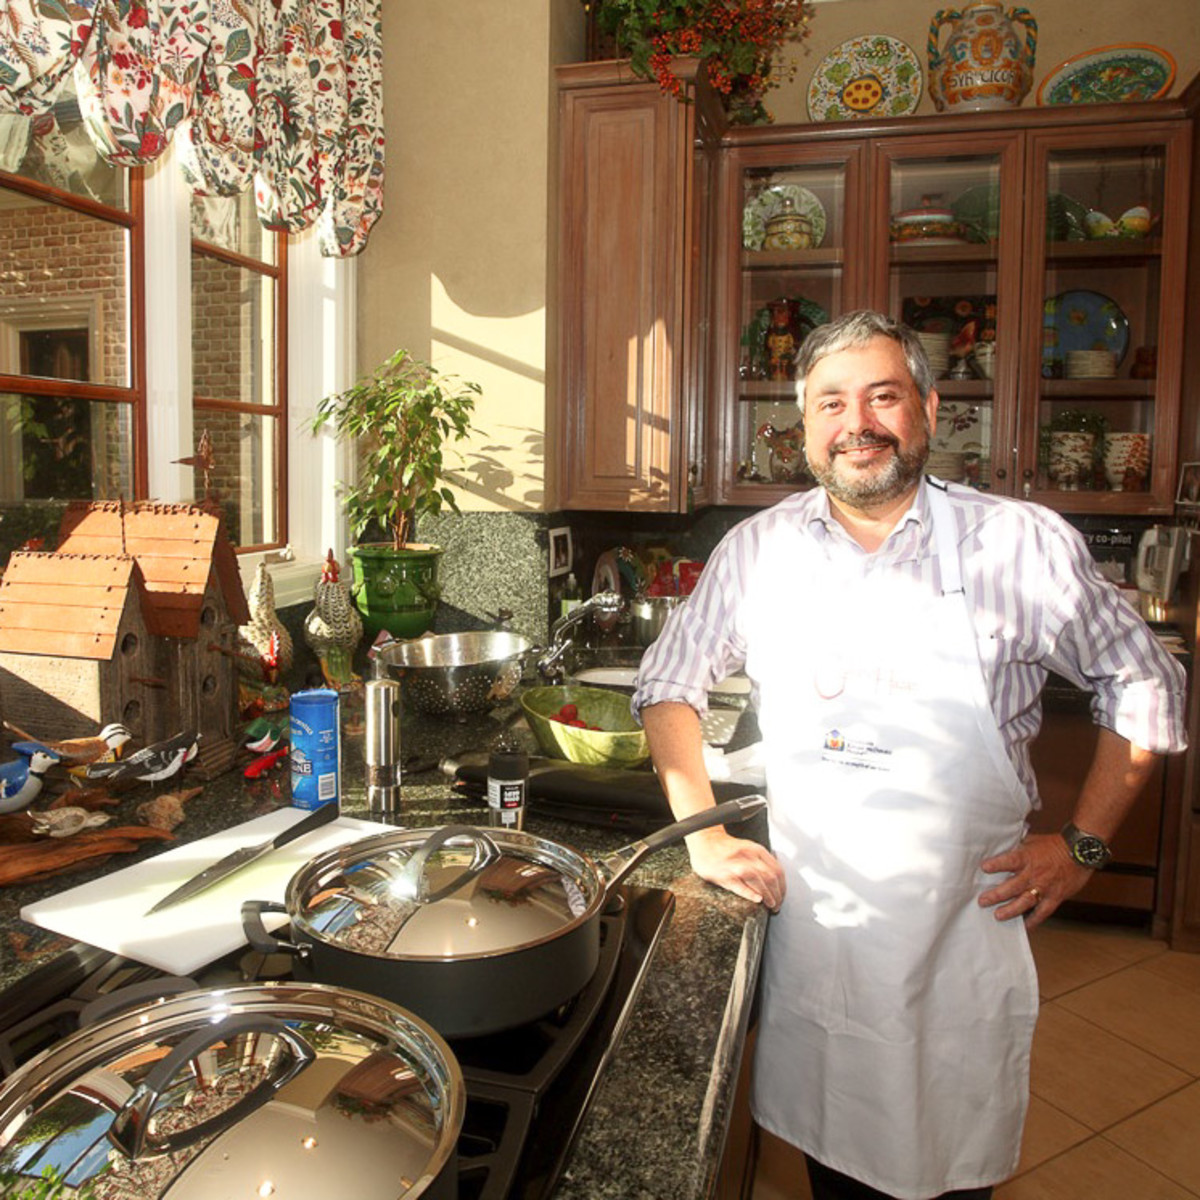 News_Chef Giuliano Hazan_in kitchen